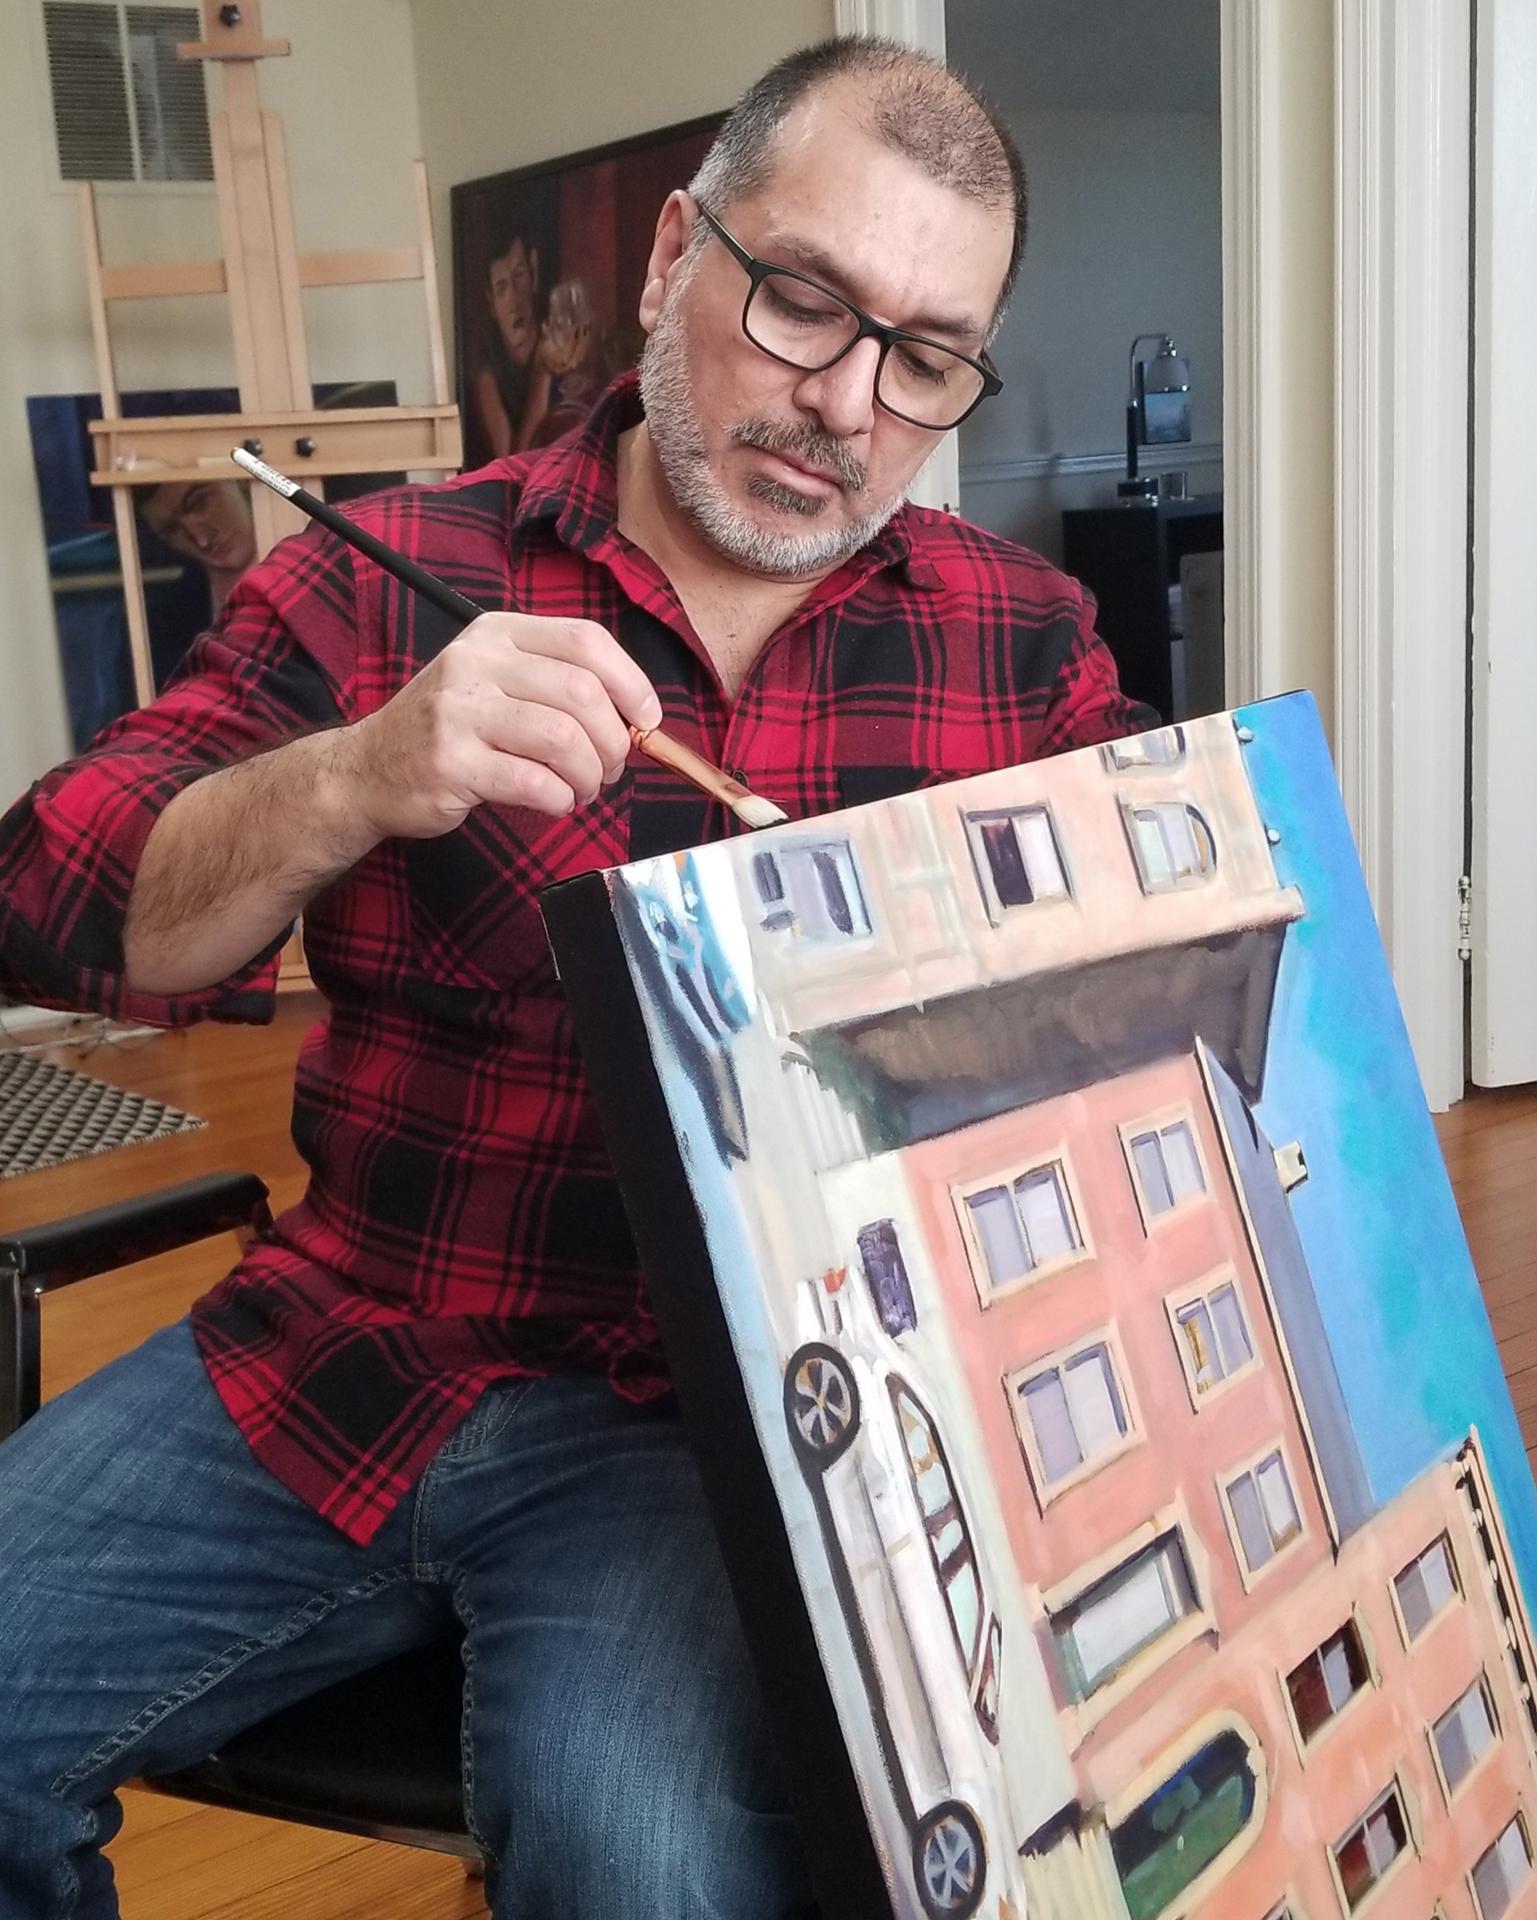 Frenchtown-based painter Francisco Silva